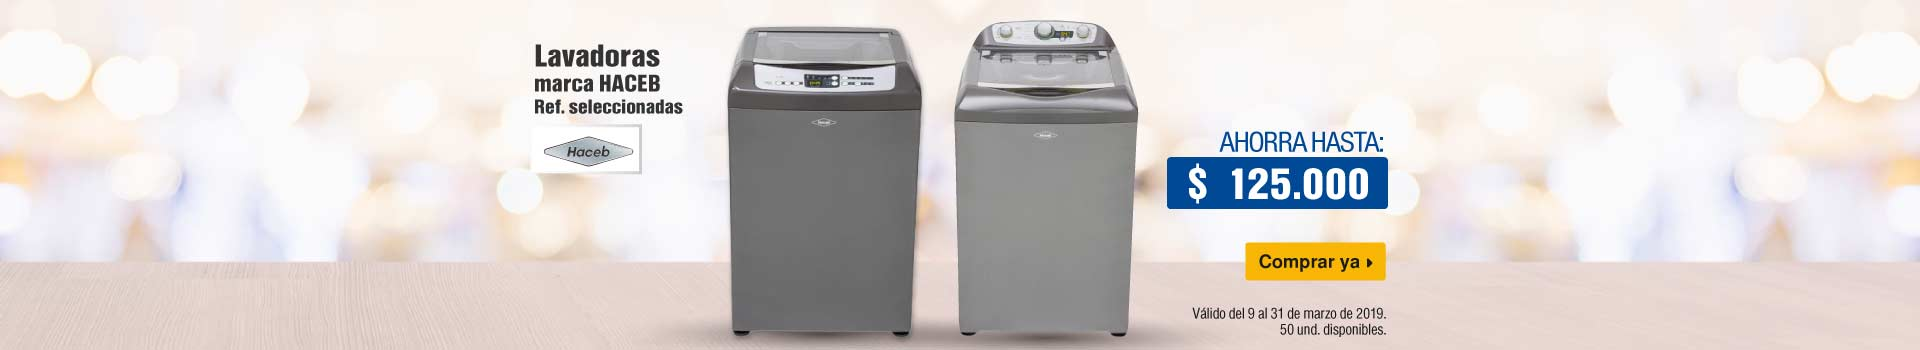 AK-KT-mayores-2-ELECT-BCAT-lavadoras-HACEB-060319